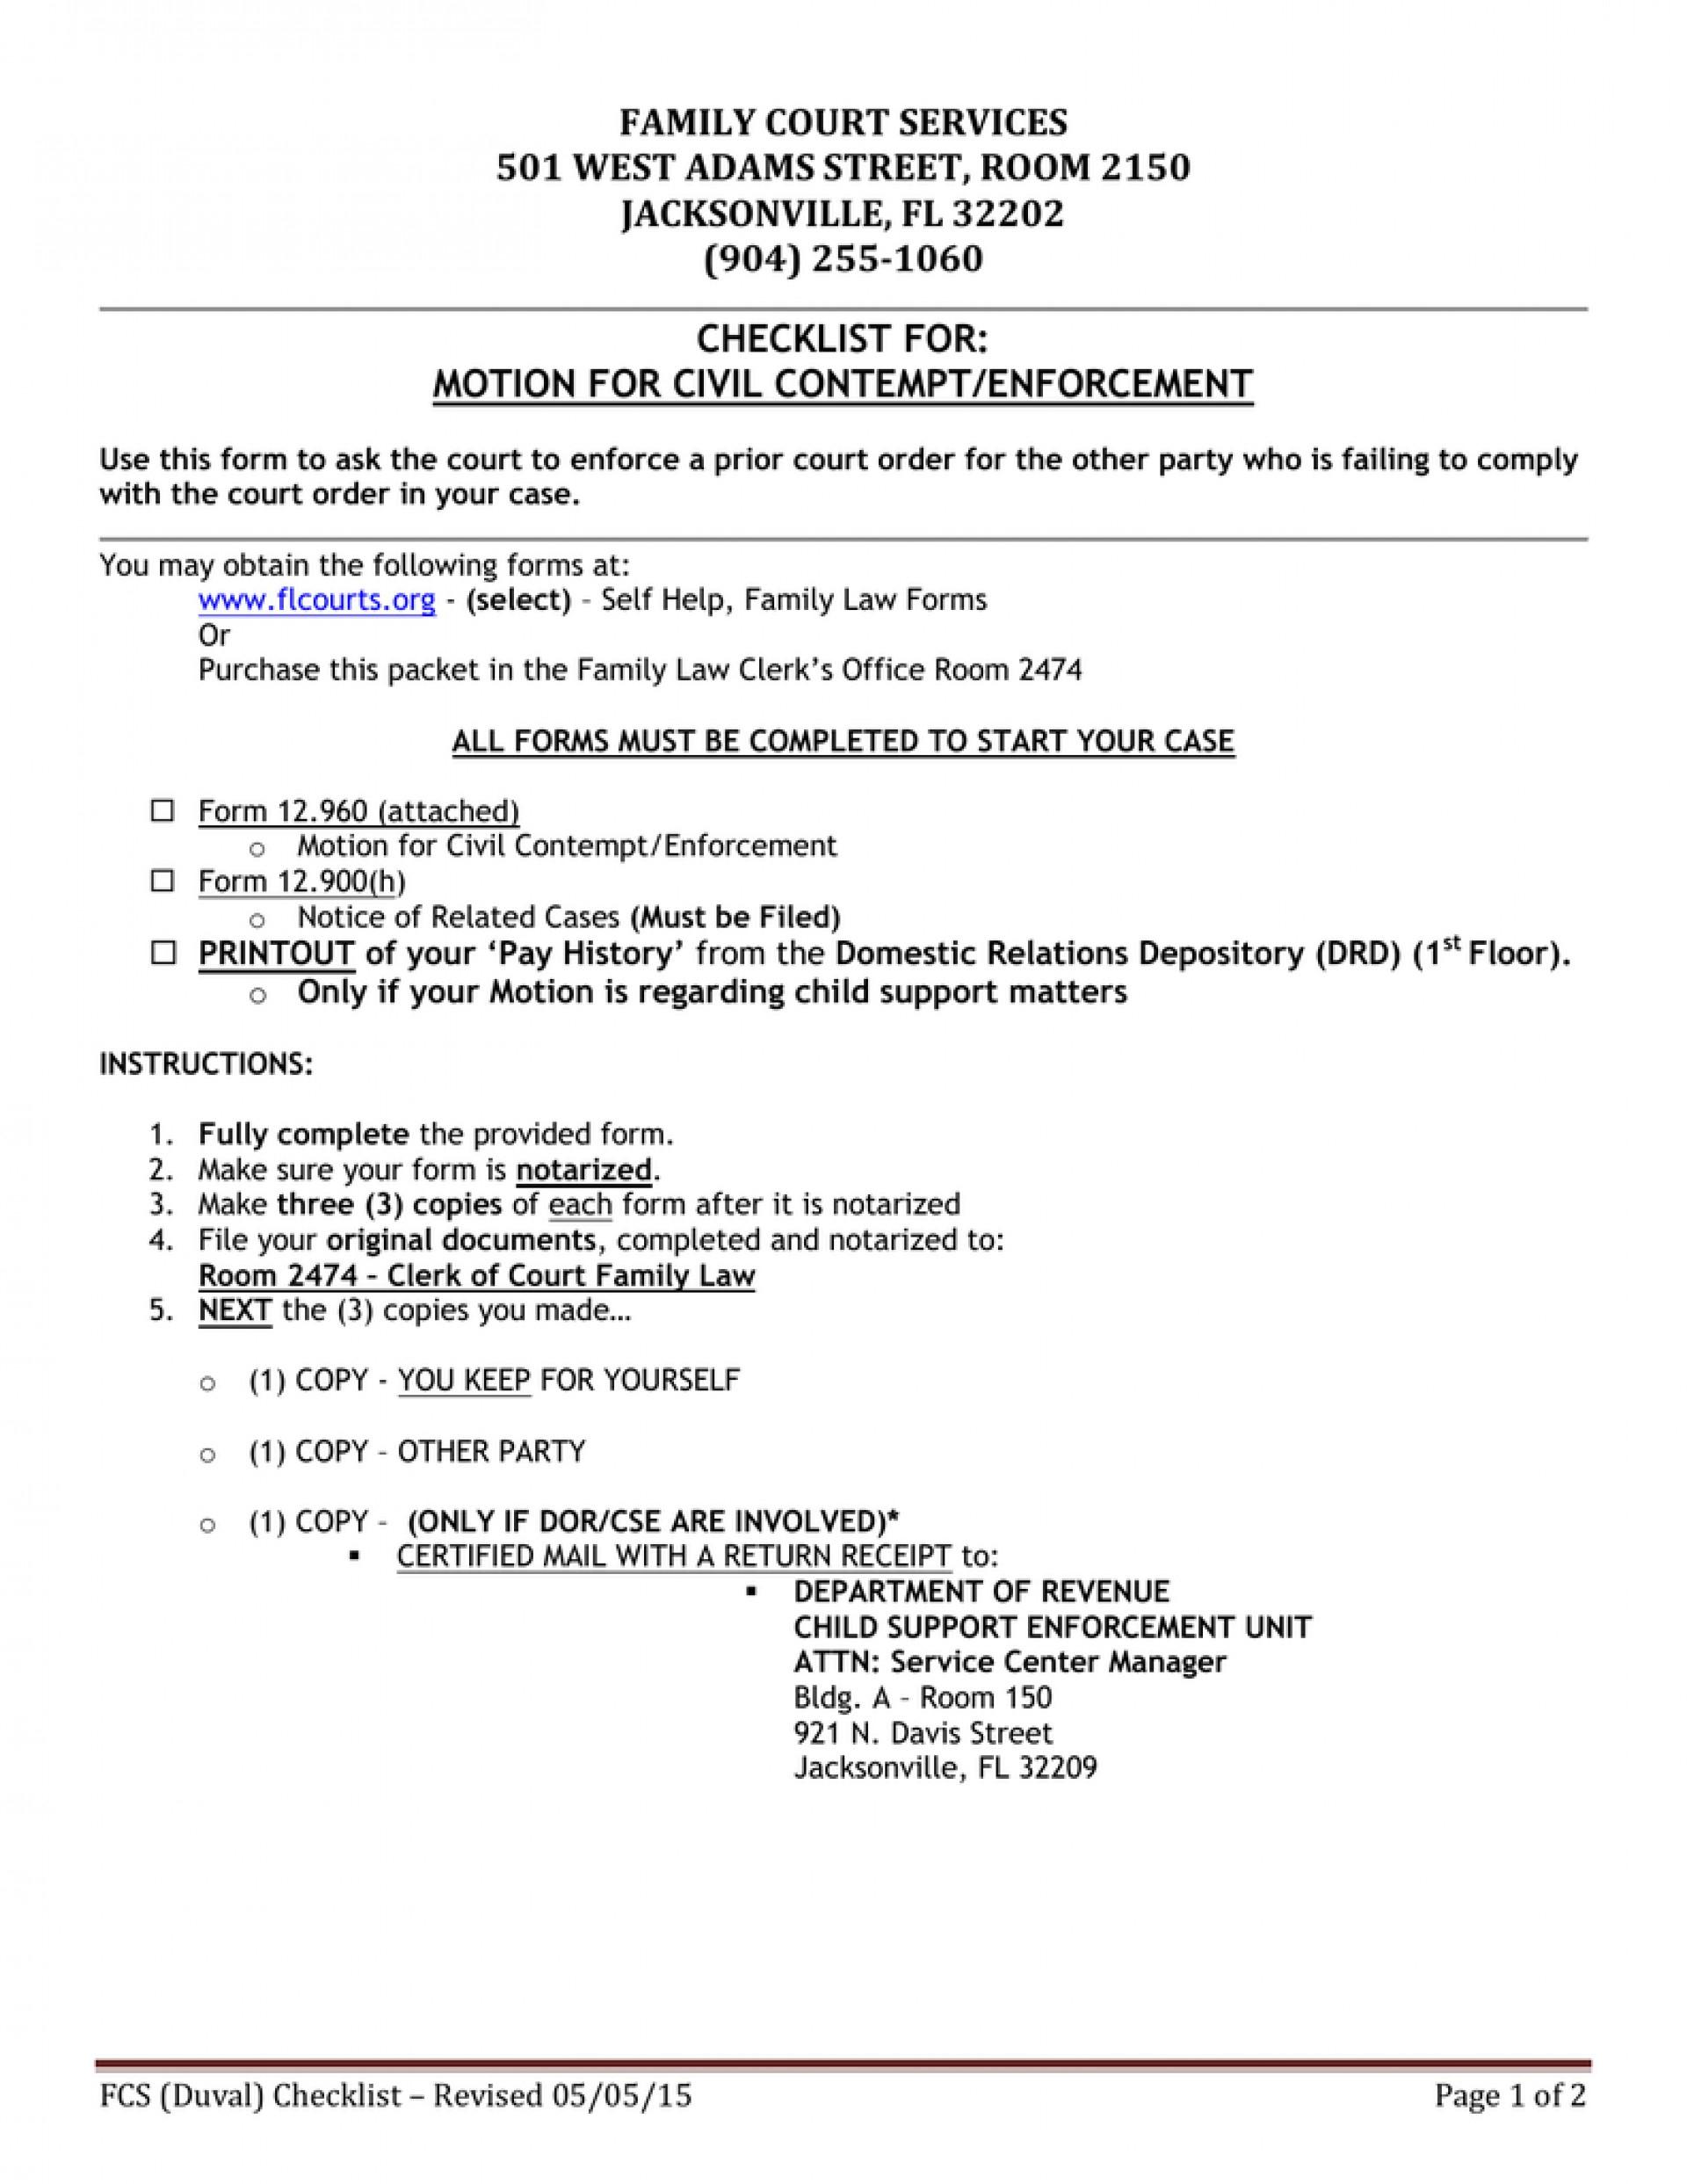 Florida Financial Affidavit Excel Spreadsheet In Wonderful Family Law Forms Form Templates California Pdf Oregon